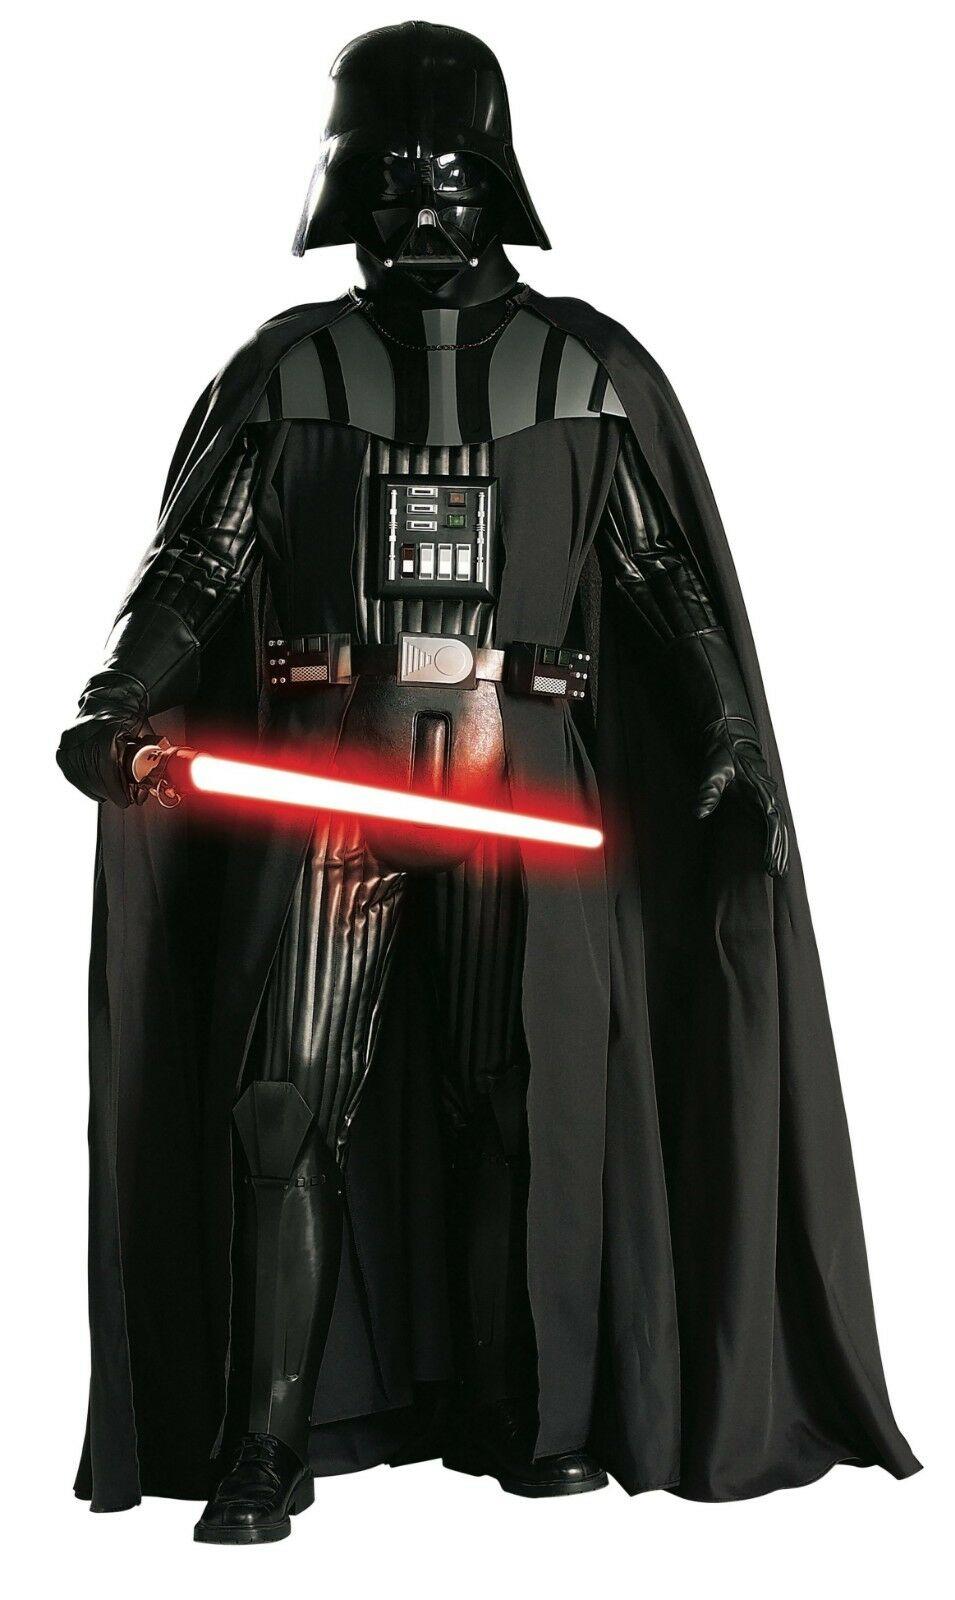 Darth Vader Halloween Cosplay Costume